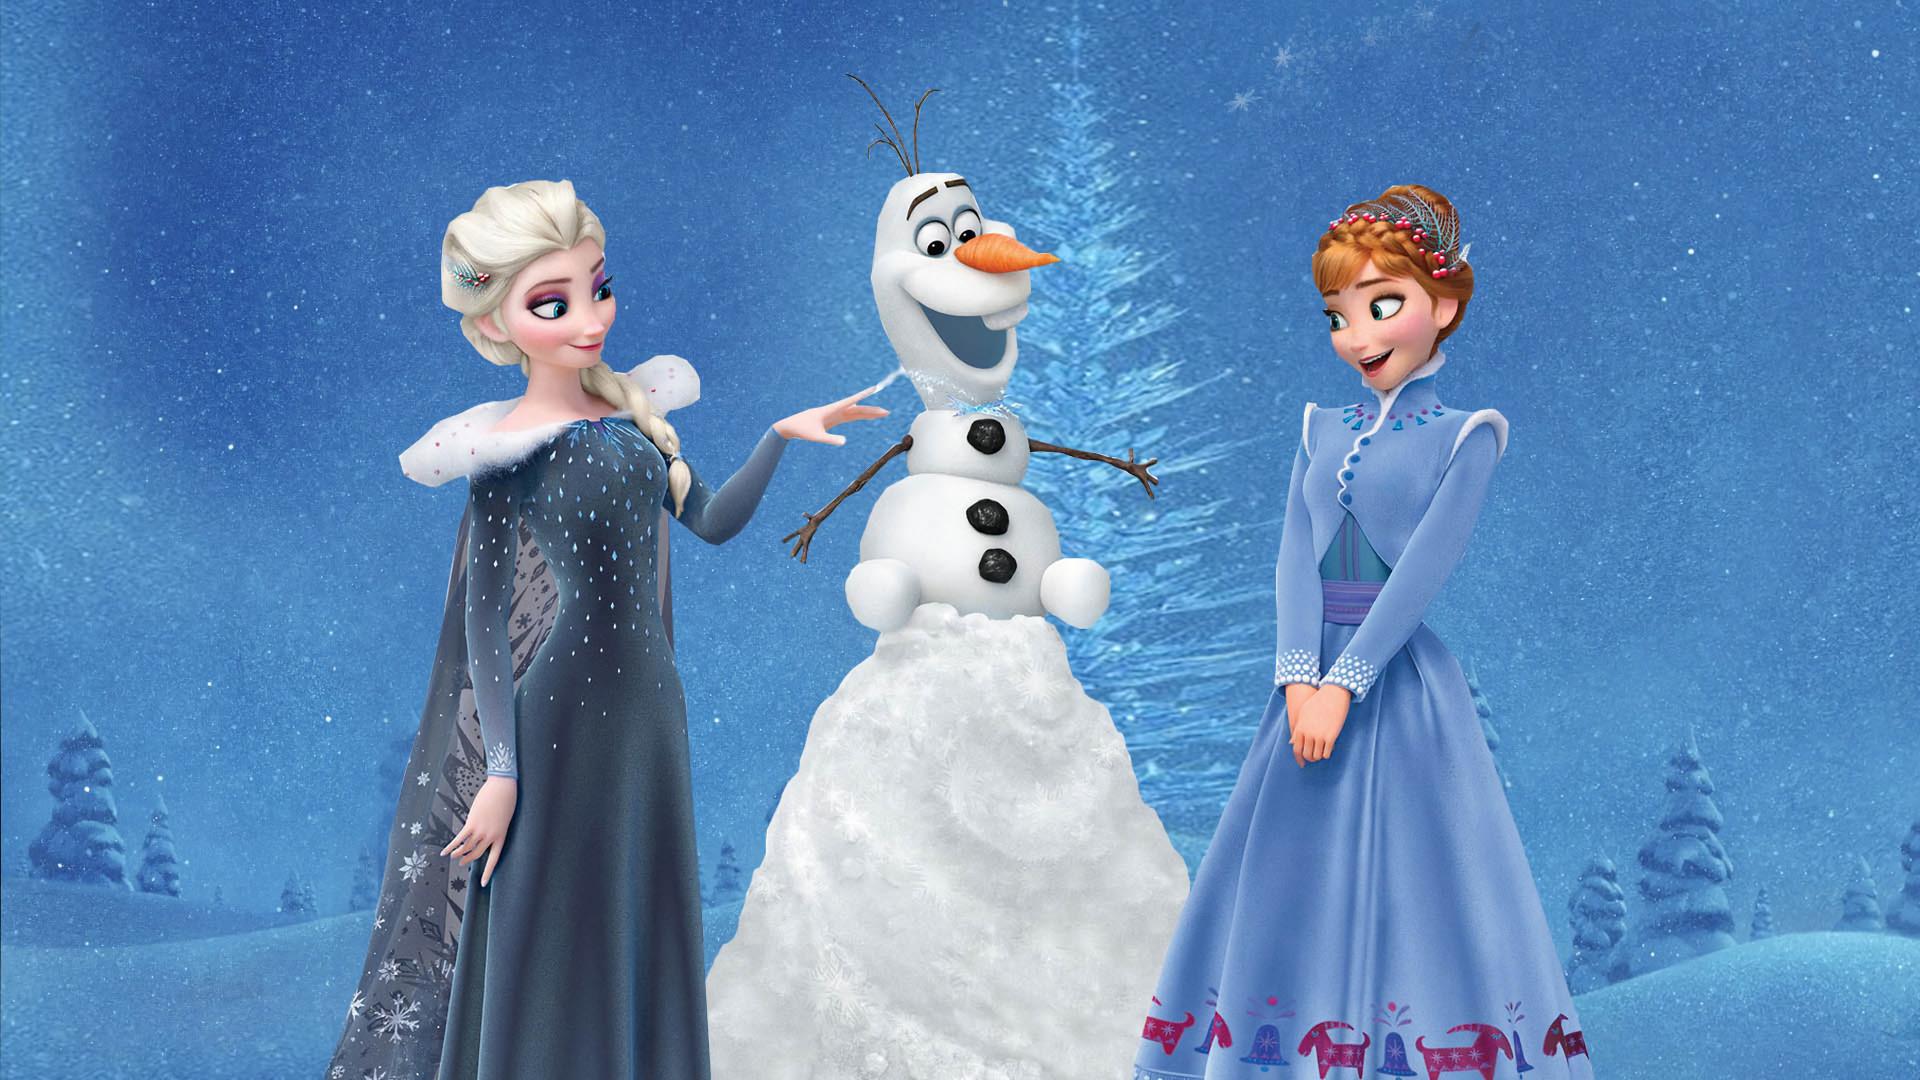 frozen wallpaper,white,cartoon,snow,animation,animated cartoon